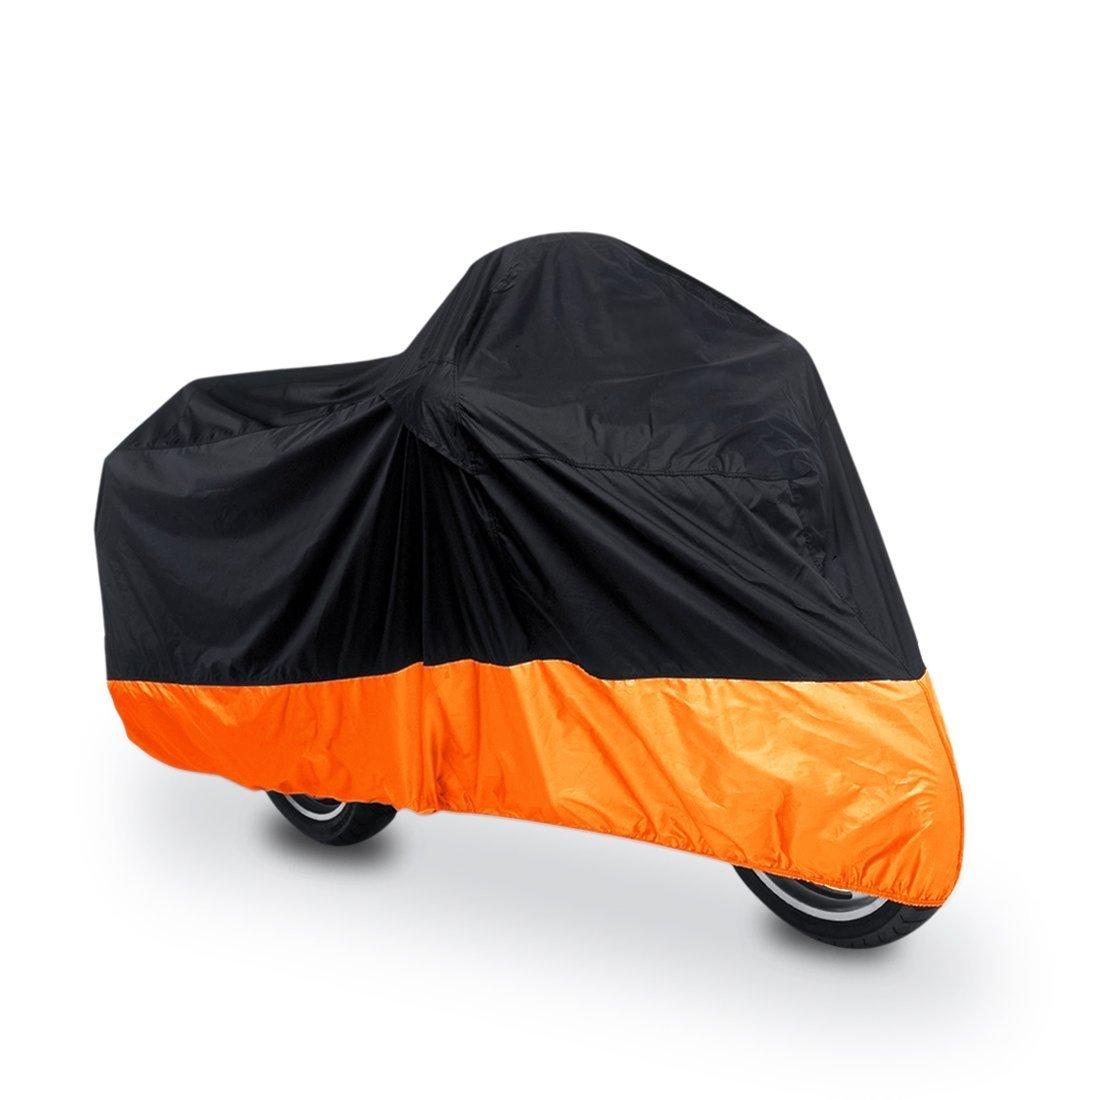 Universal Waterproof Dust Sun proof Indoor Outdoor Motorcycle Motorbike Cover for Harley Davison, Honda, Suzuki, Yamaha, Kawazaki Etc, Package Bag Include (XL, Black/Orange)